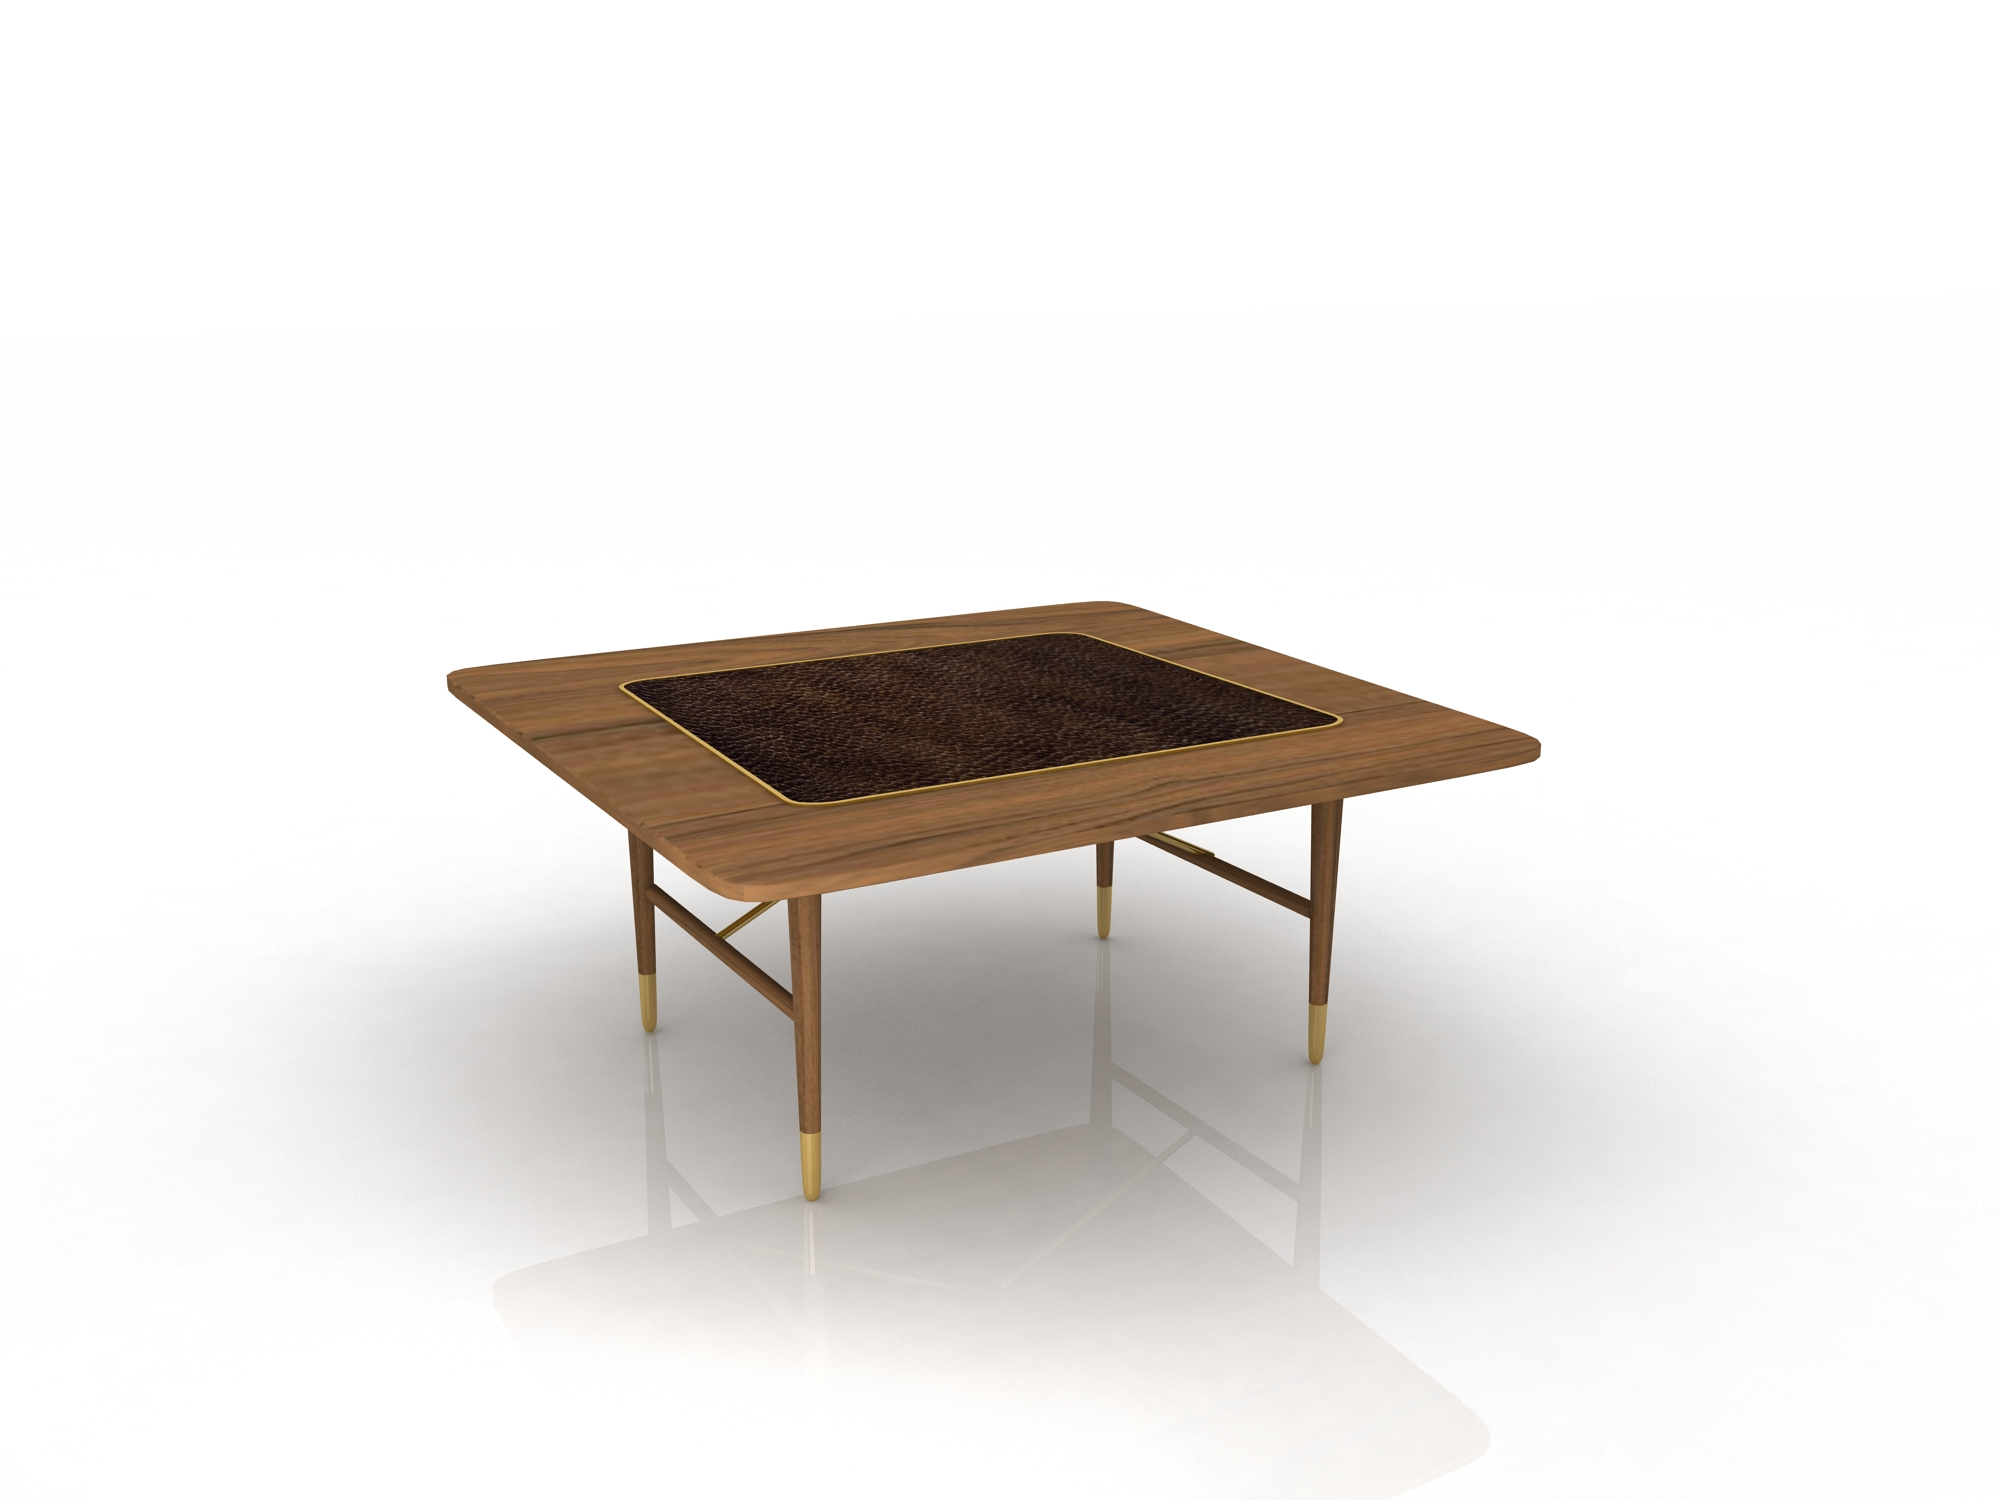 GI-08-COFFEE-TABLE-SQUARED.jpg